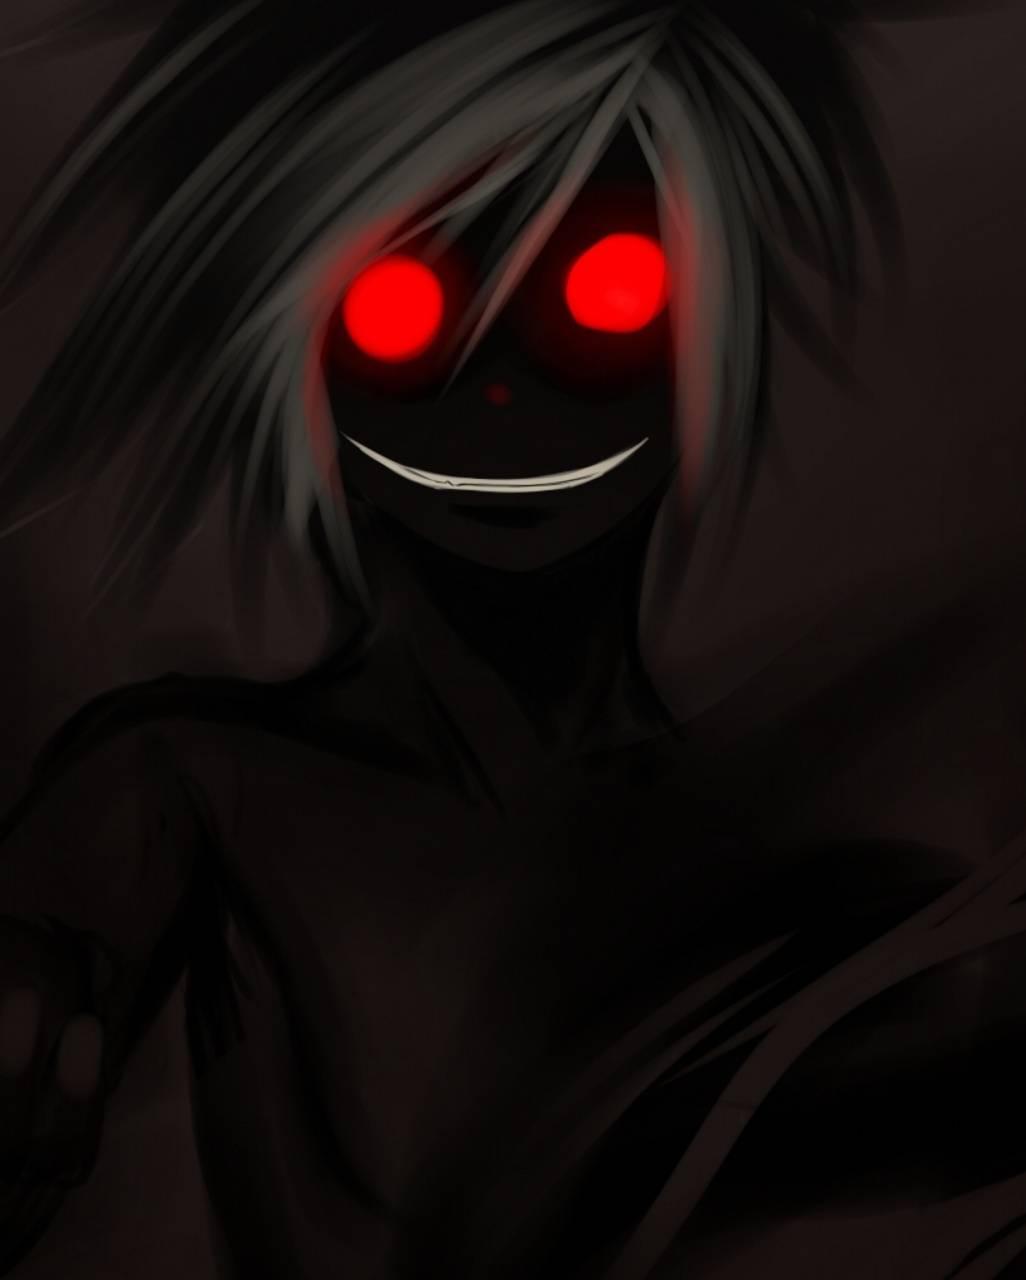 Scary Anime Pictures : scary, anime, pictures, Scary, Anime, Wallpaper, Tachi